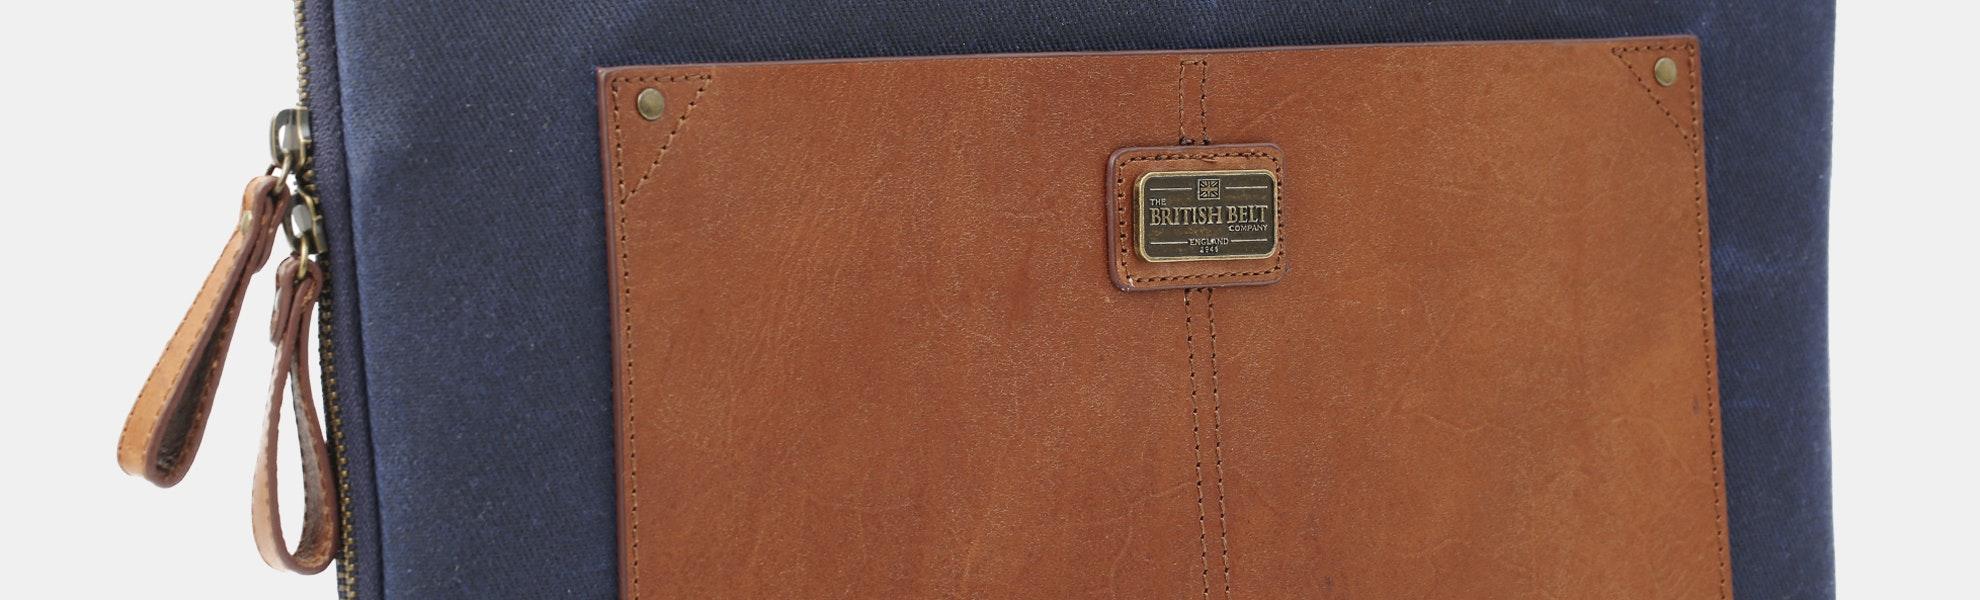 The British Belt Company Langdale Portfolio